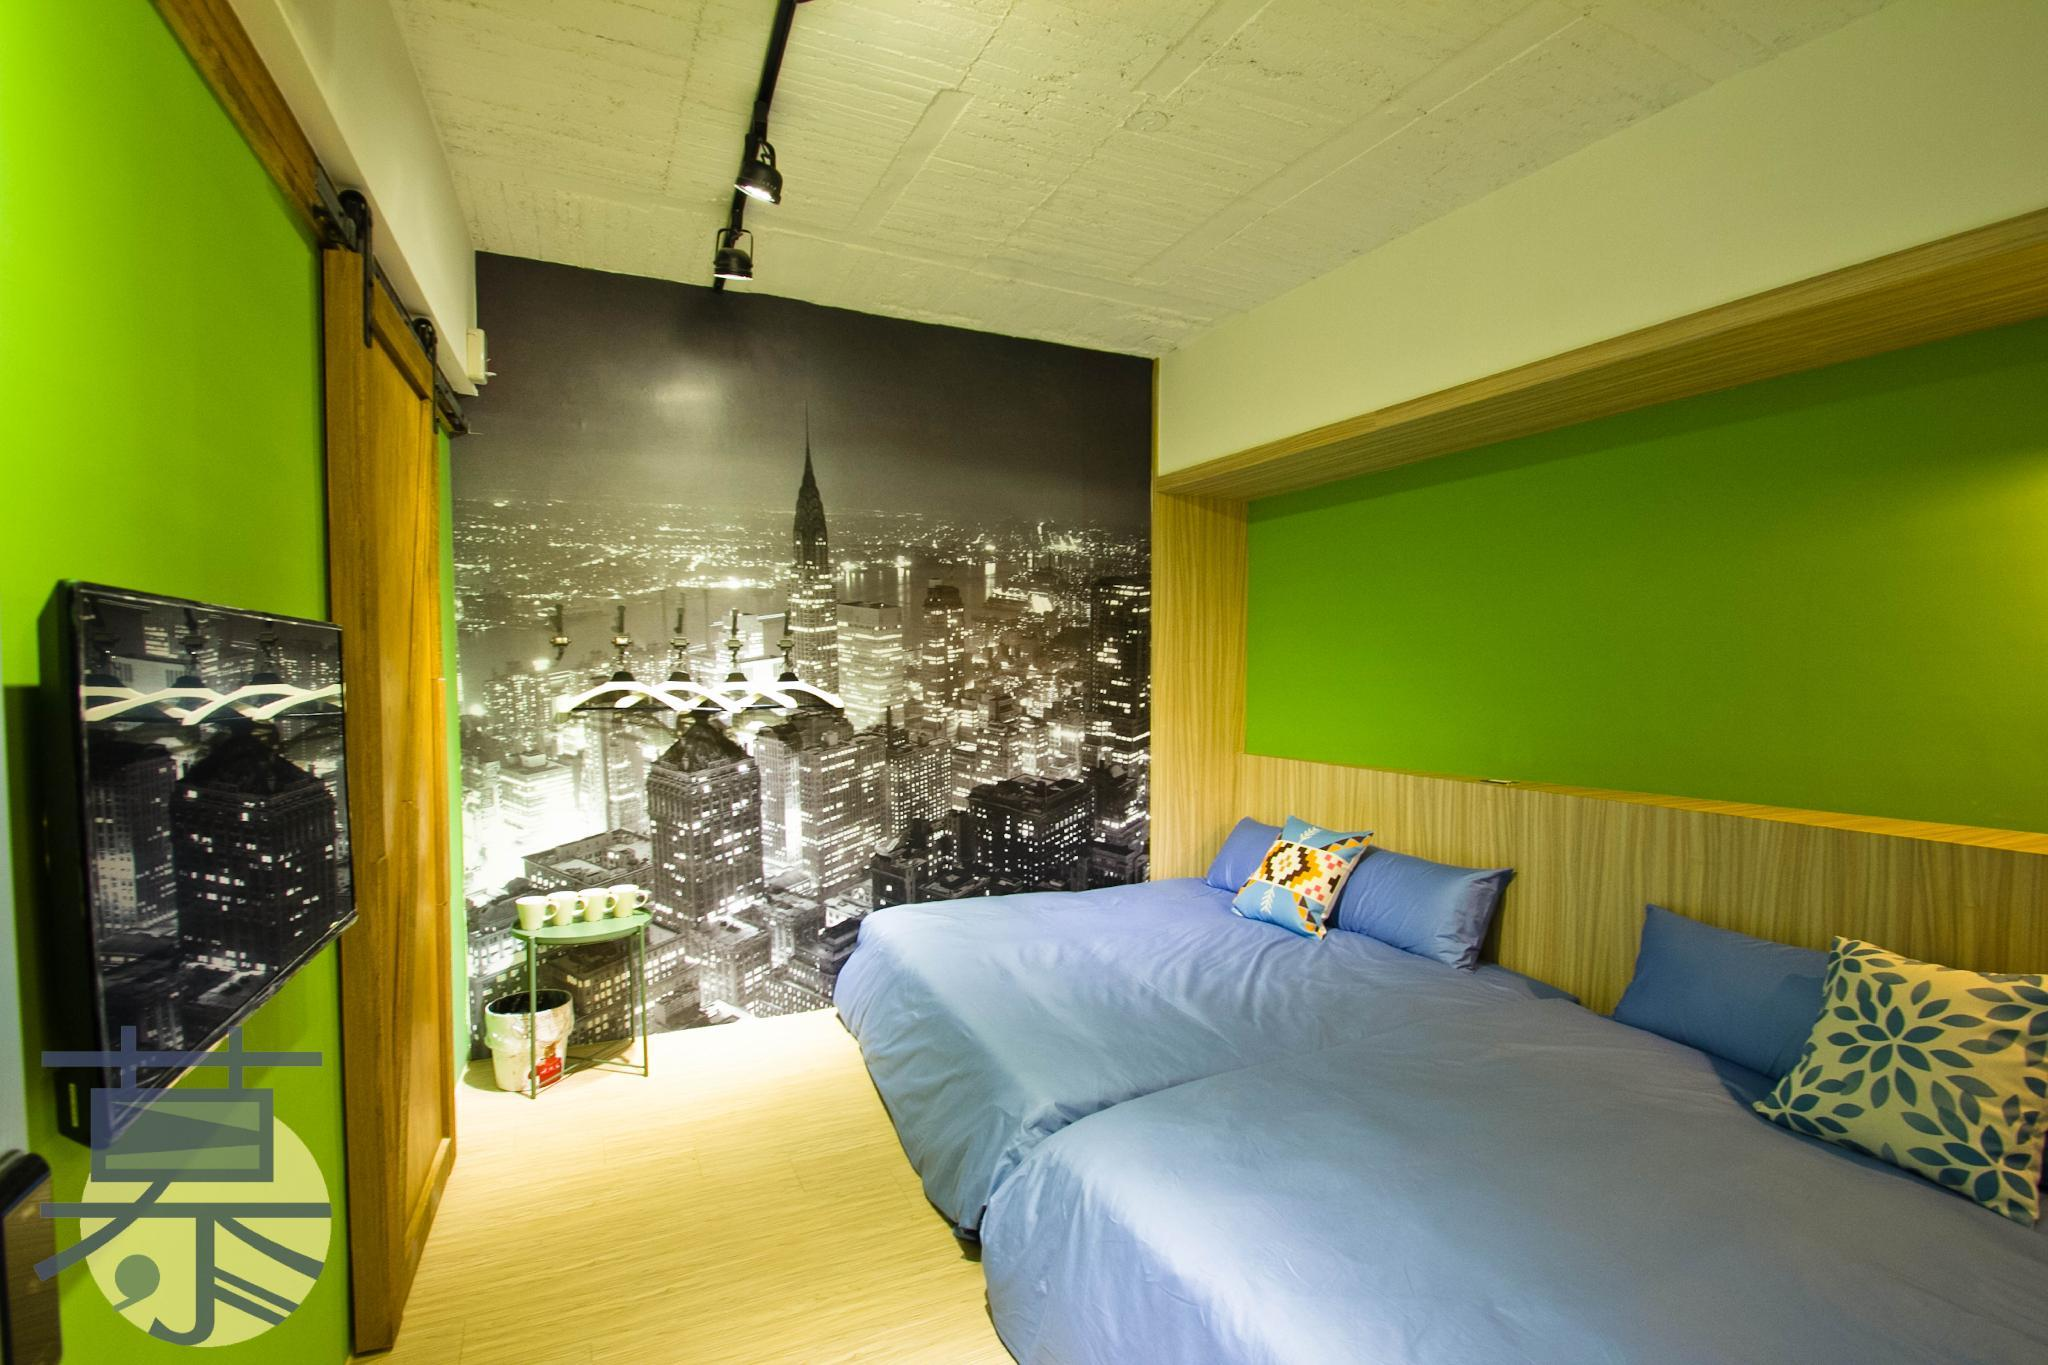 mu hostel - Alice in wonderland Quad Room